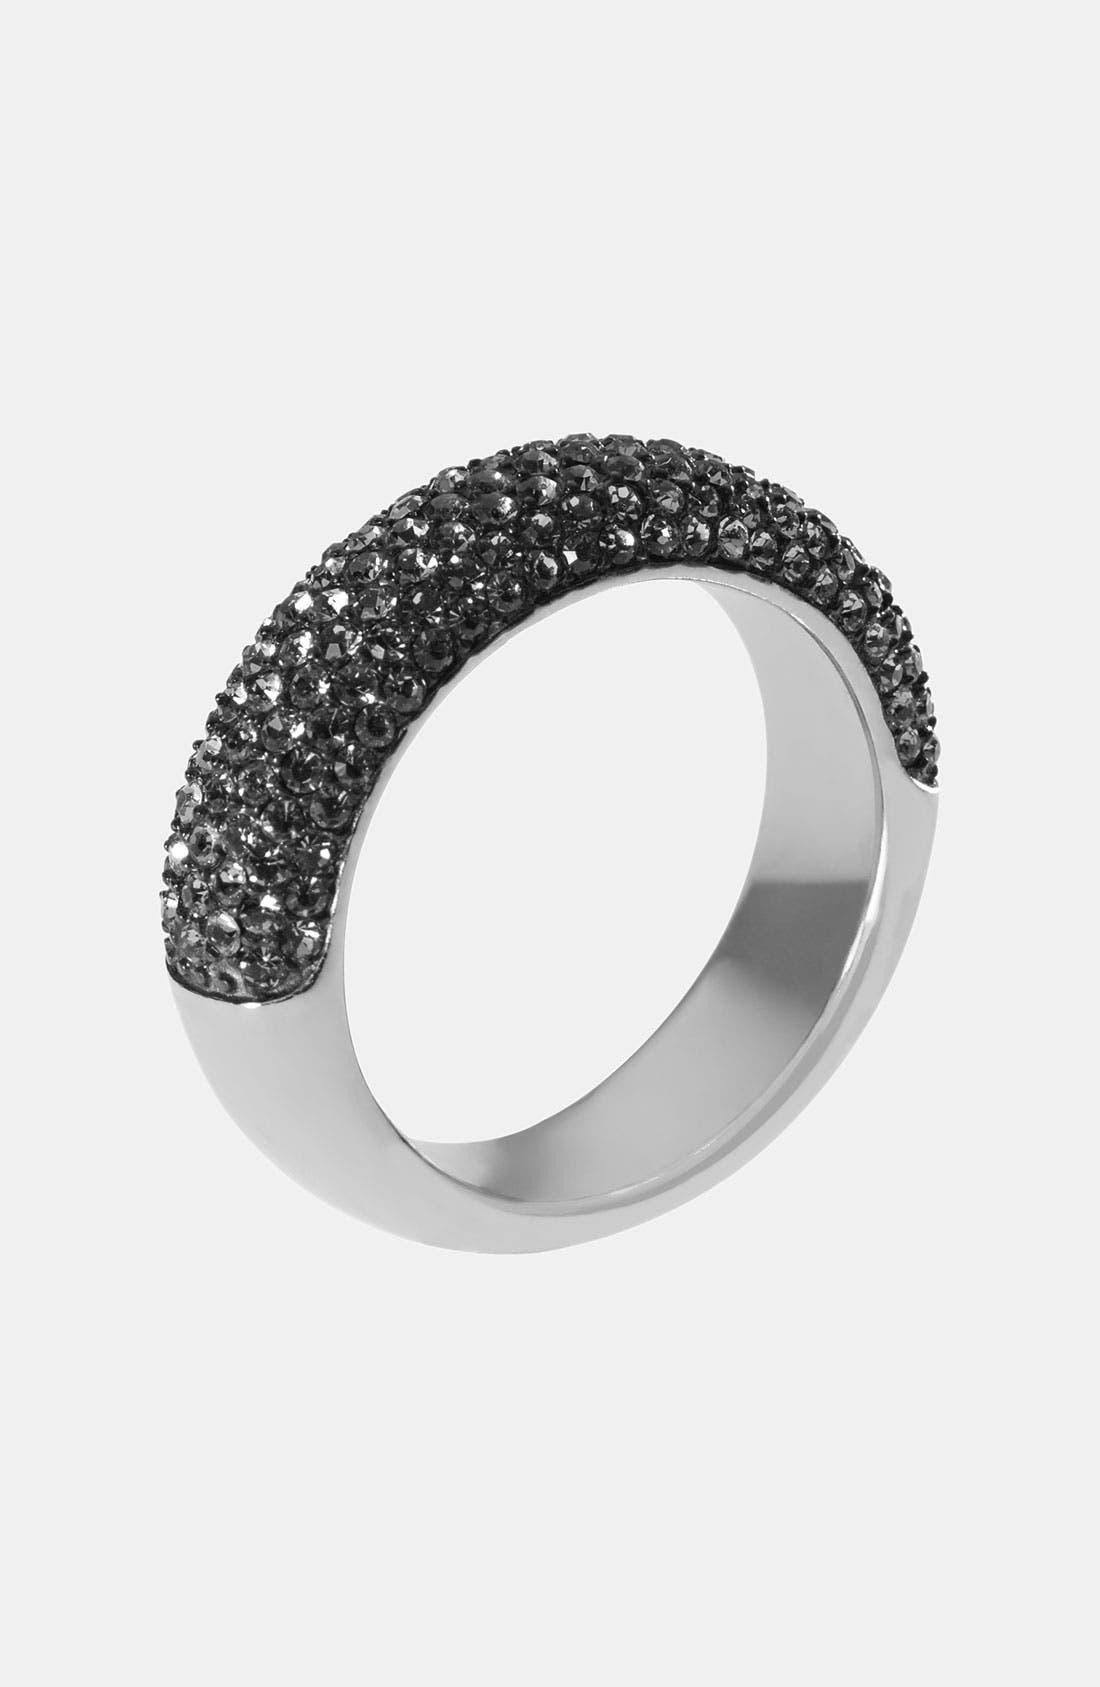 Main Image - Michael Kors 'Brilliance' Dome Ring